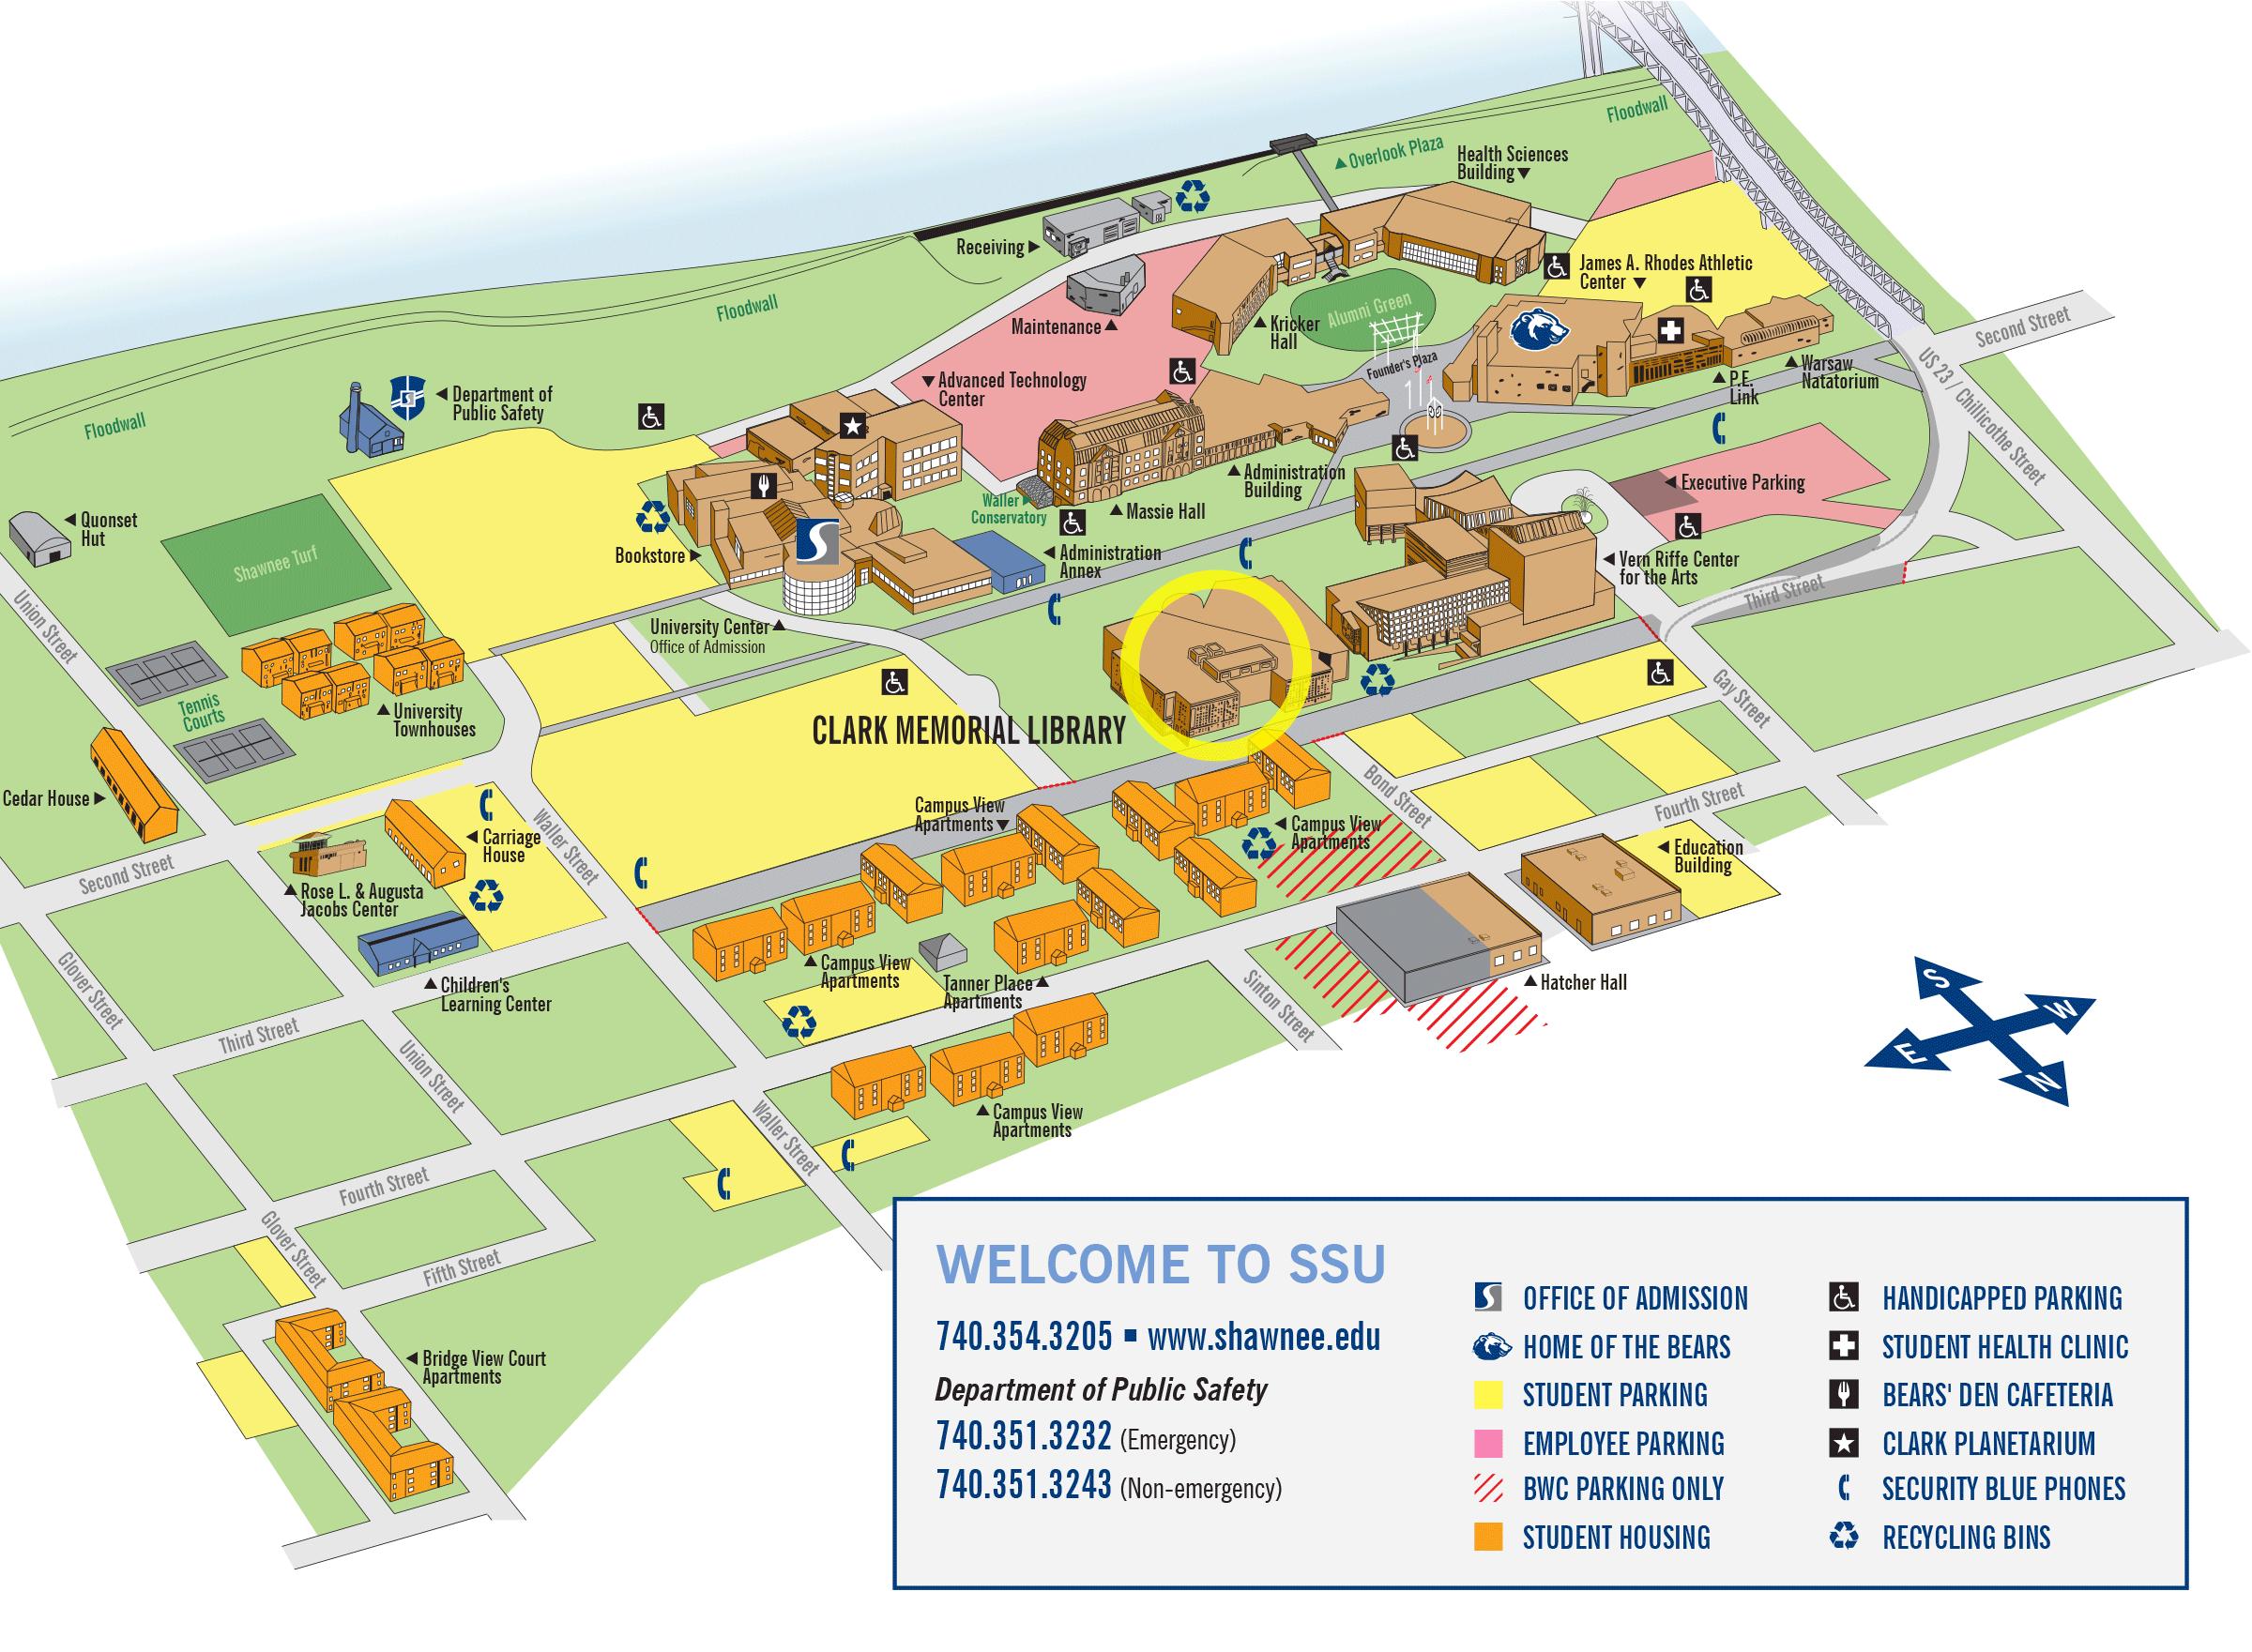 shawnee state university campus map Shawnee State University Campus Map Map Of The World shawnee state university campus map